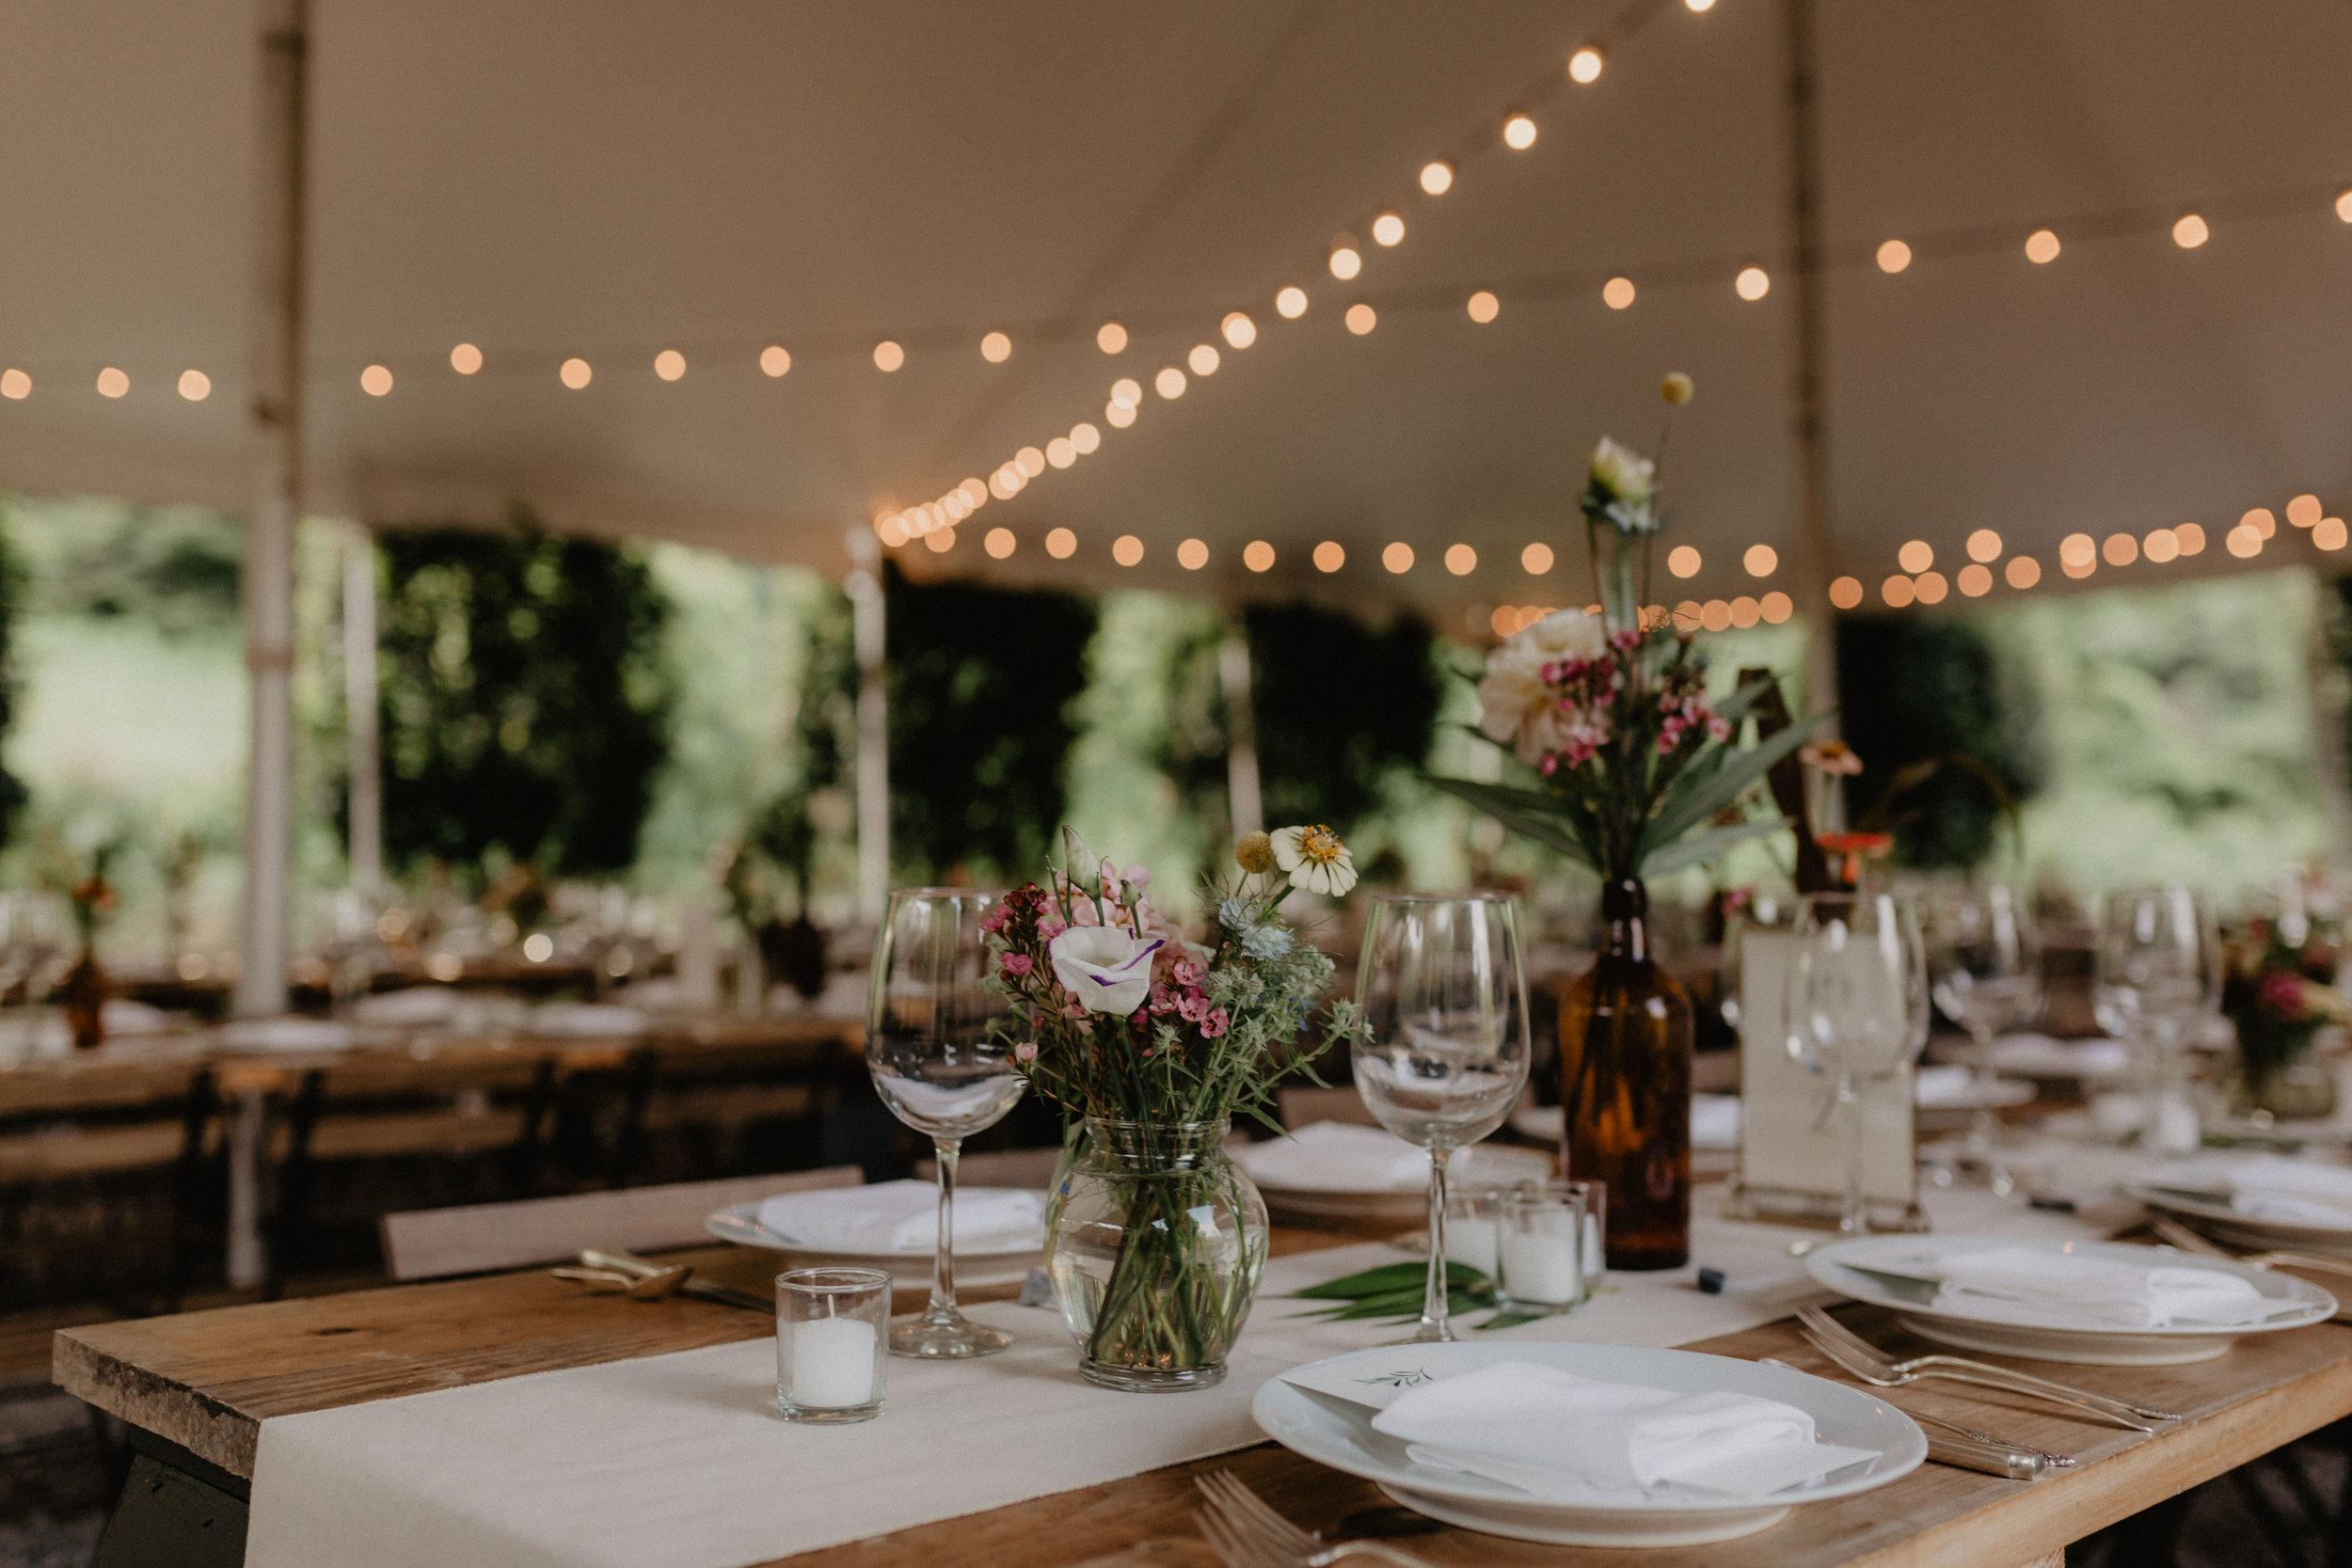 m-and-d-farm-wedding-80.jpg